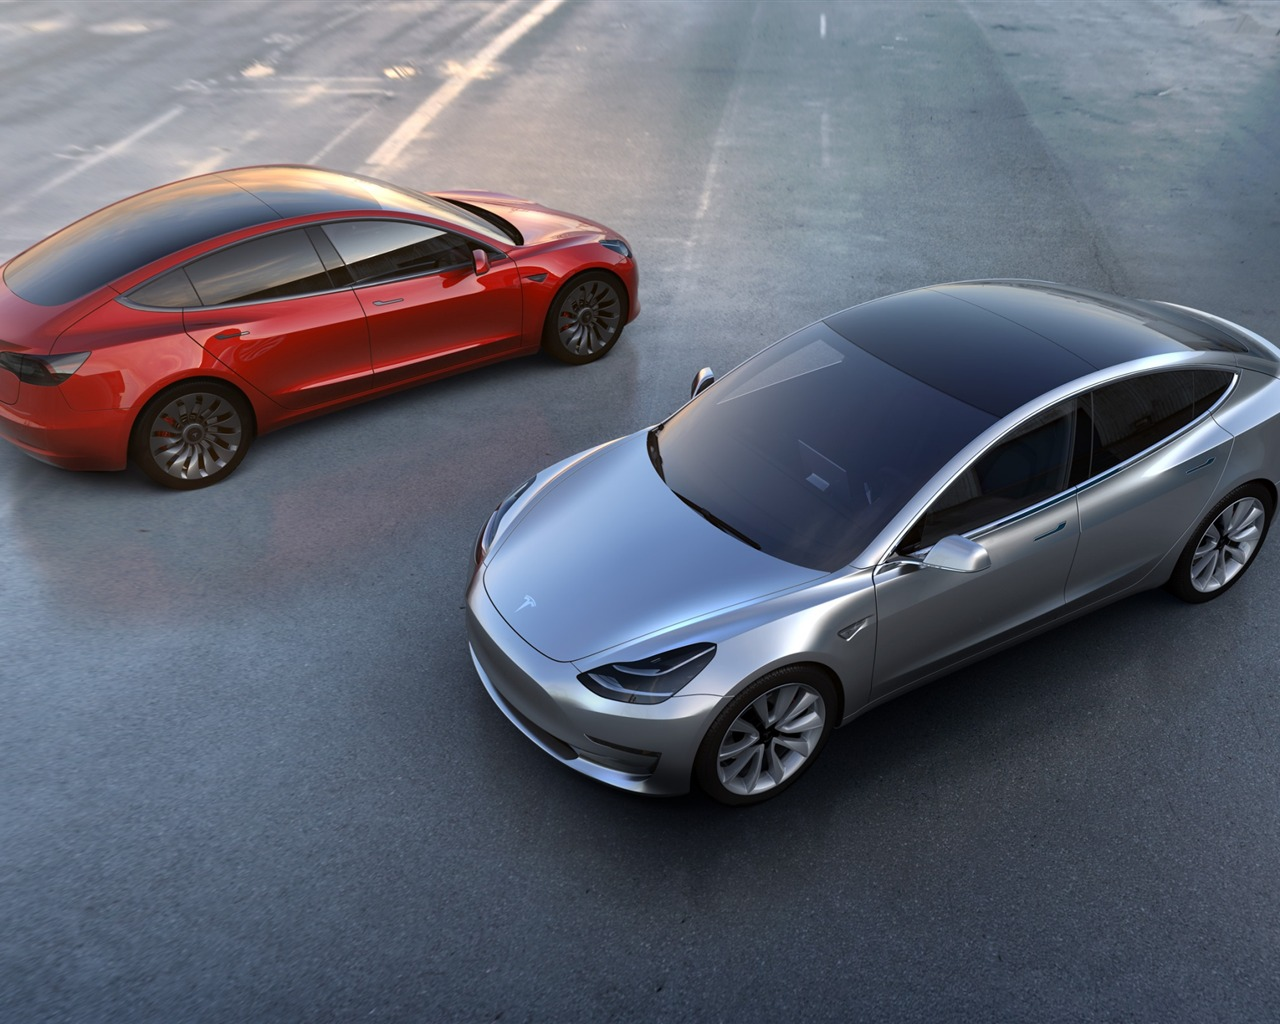 Honda Coupe 2017 >> Tesla model 3-豪华轿车高清壁纸预览 | 10wallpaper.com